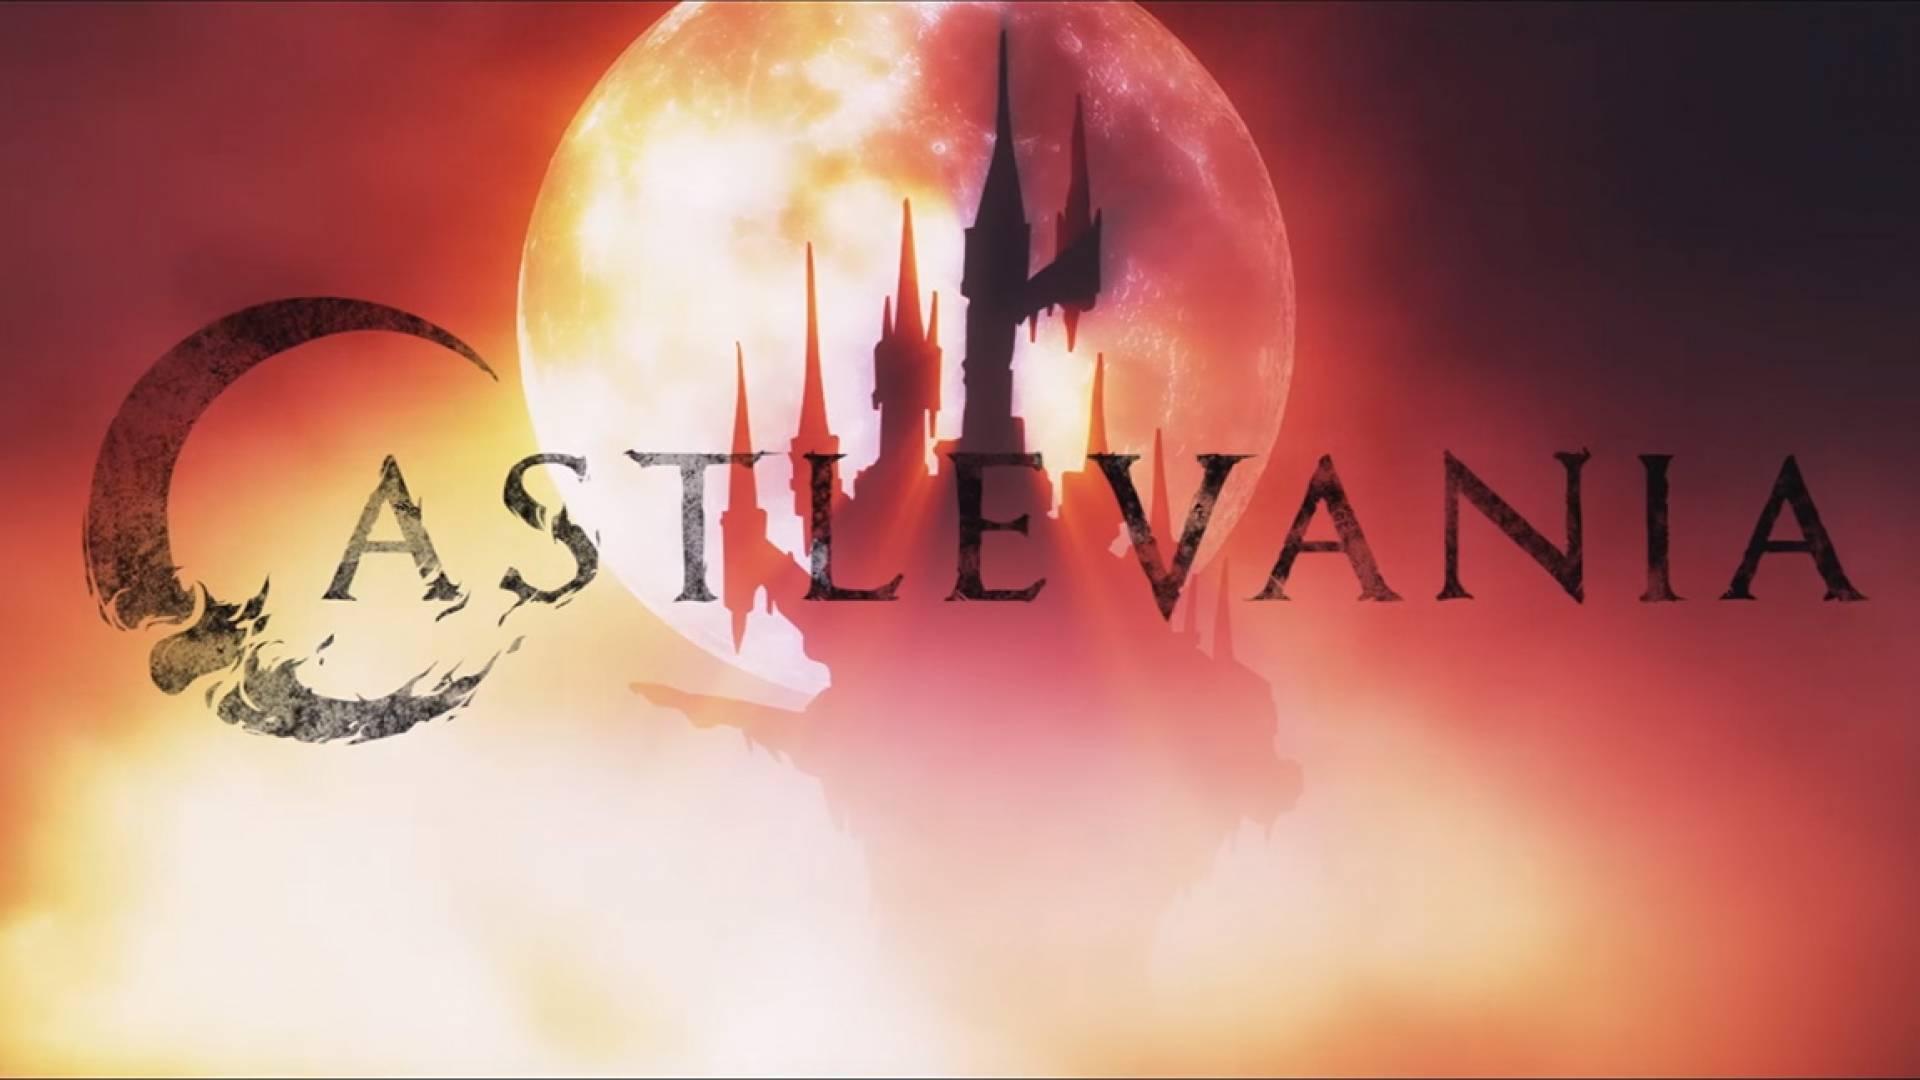 Castlevania second season trailer